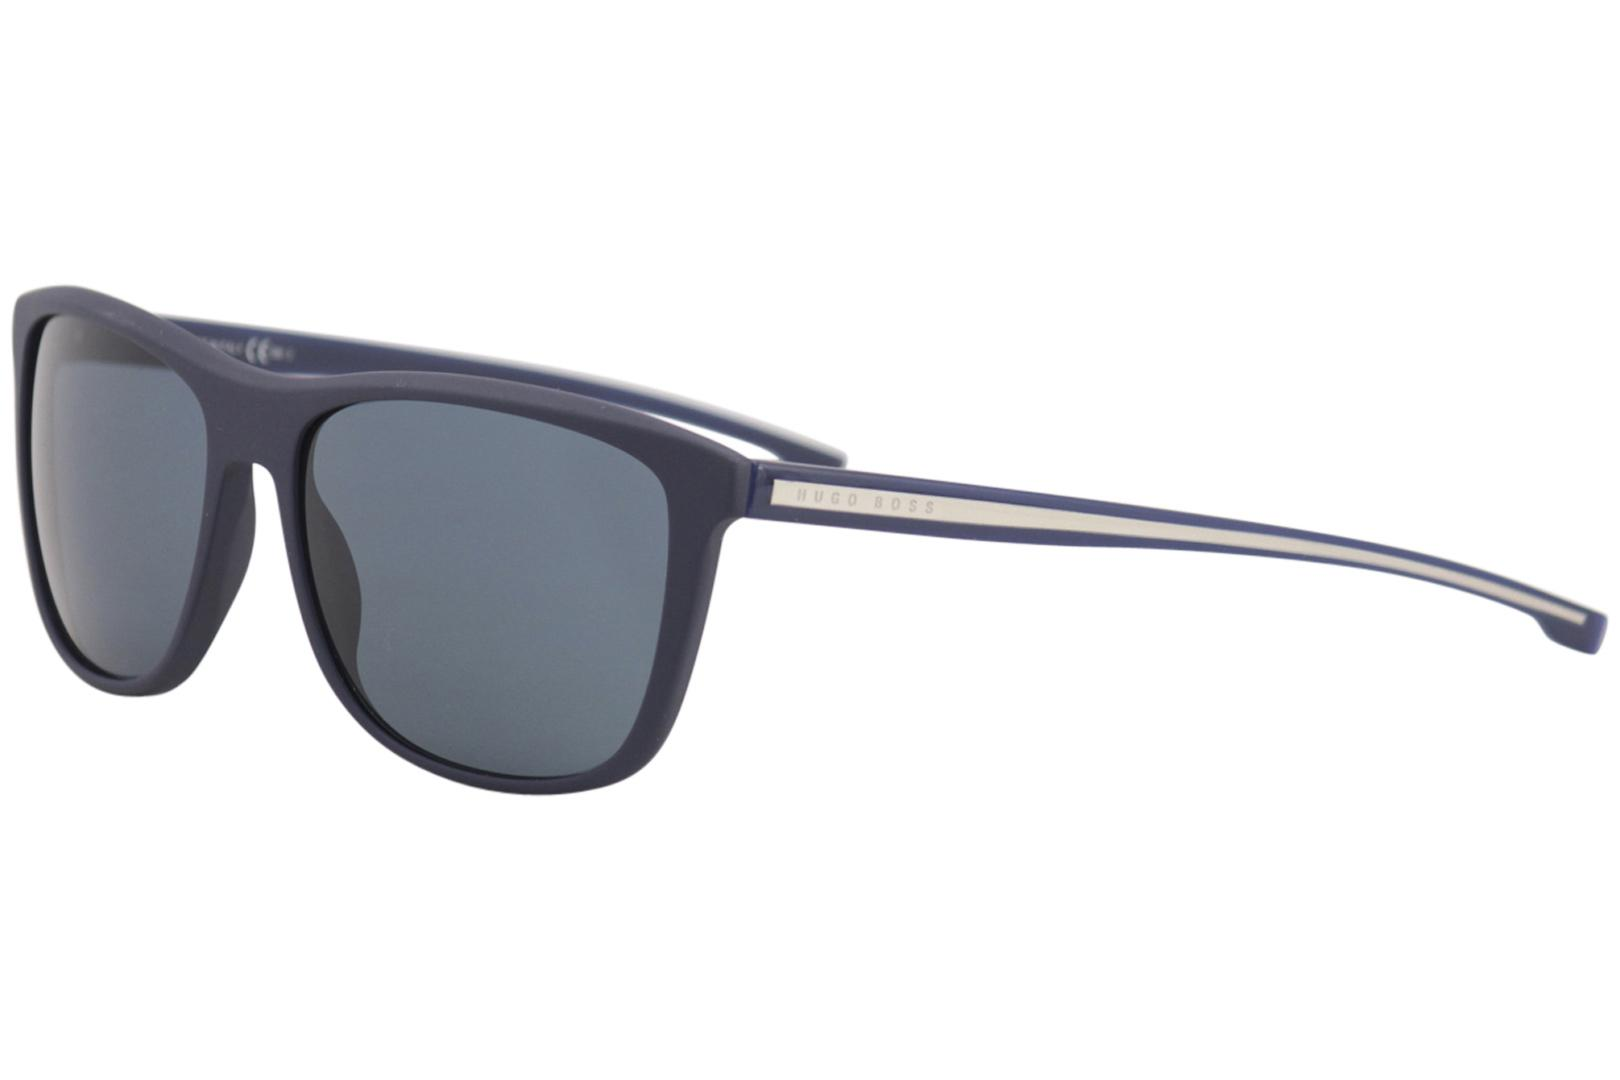 5e9f424da2 Hugo Boss Men s 0874S 0874 S Fashion Square Sunglasses